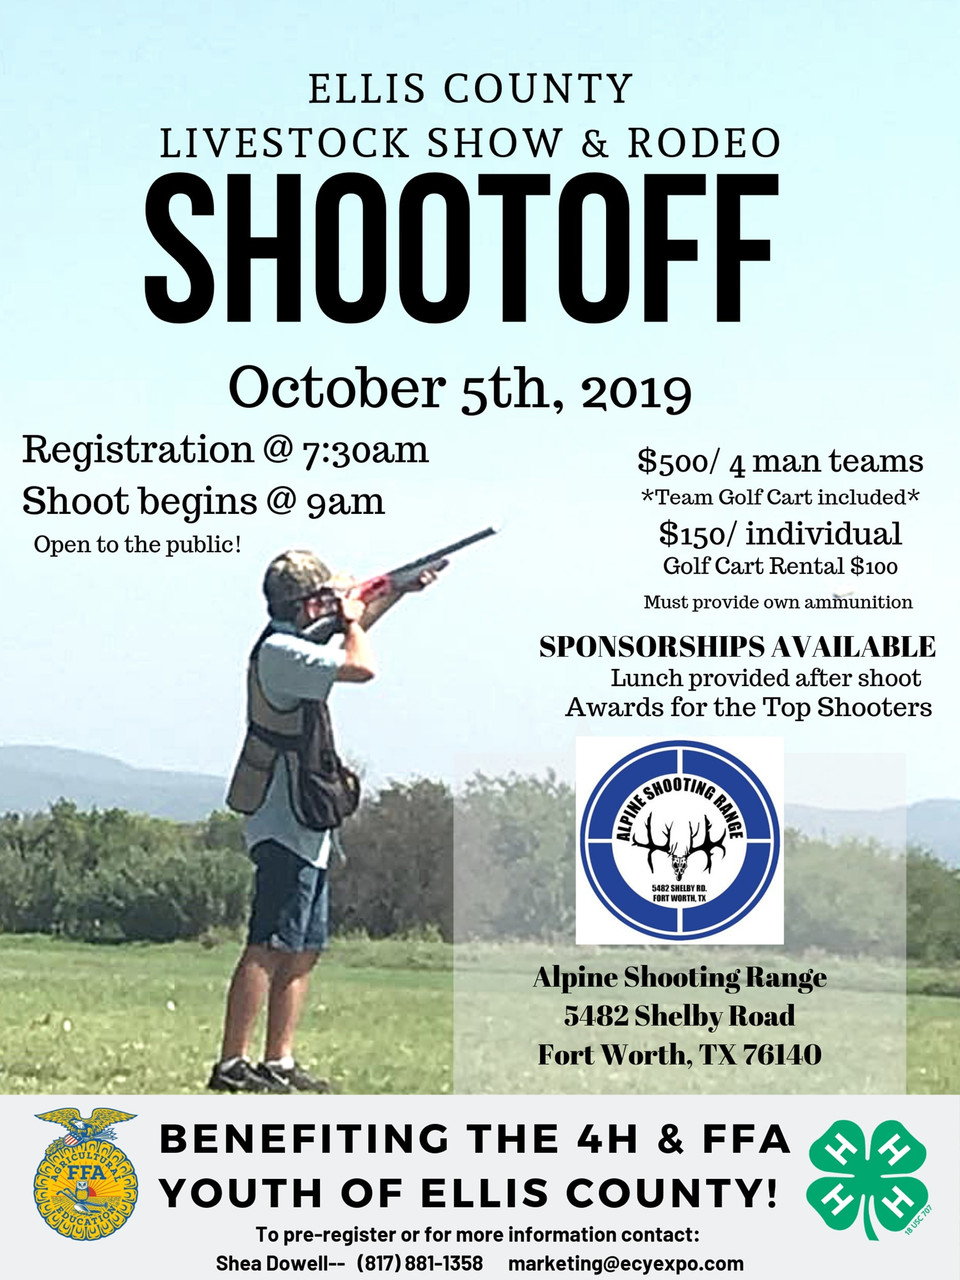 Ellis County Livestock Show & Rodeo Clay Shootoff - October 5, 2019